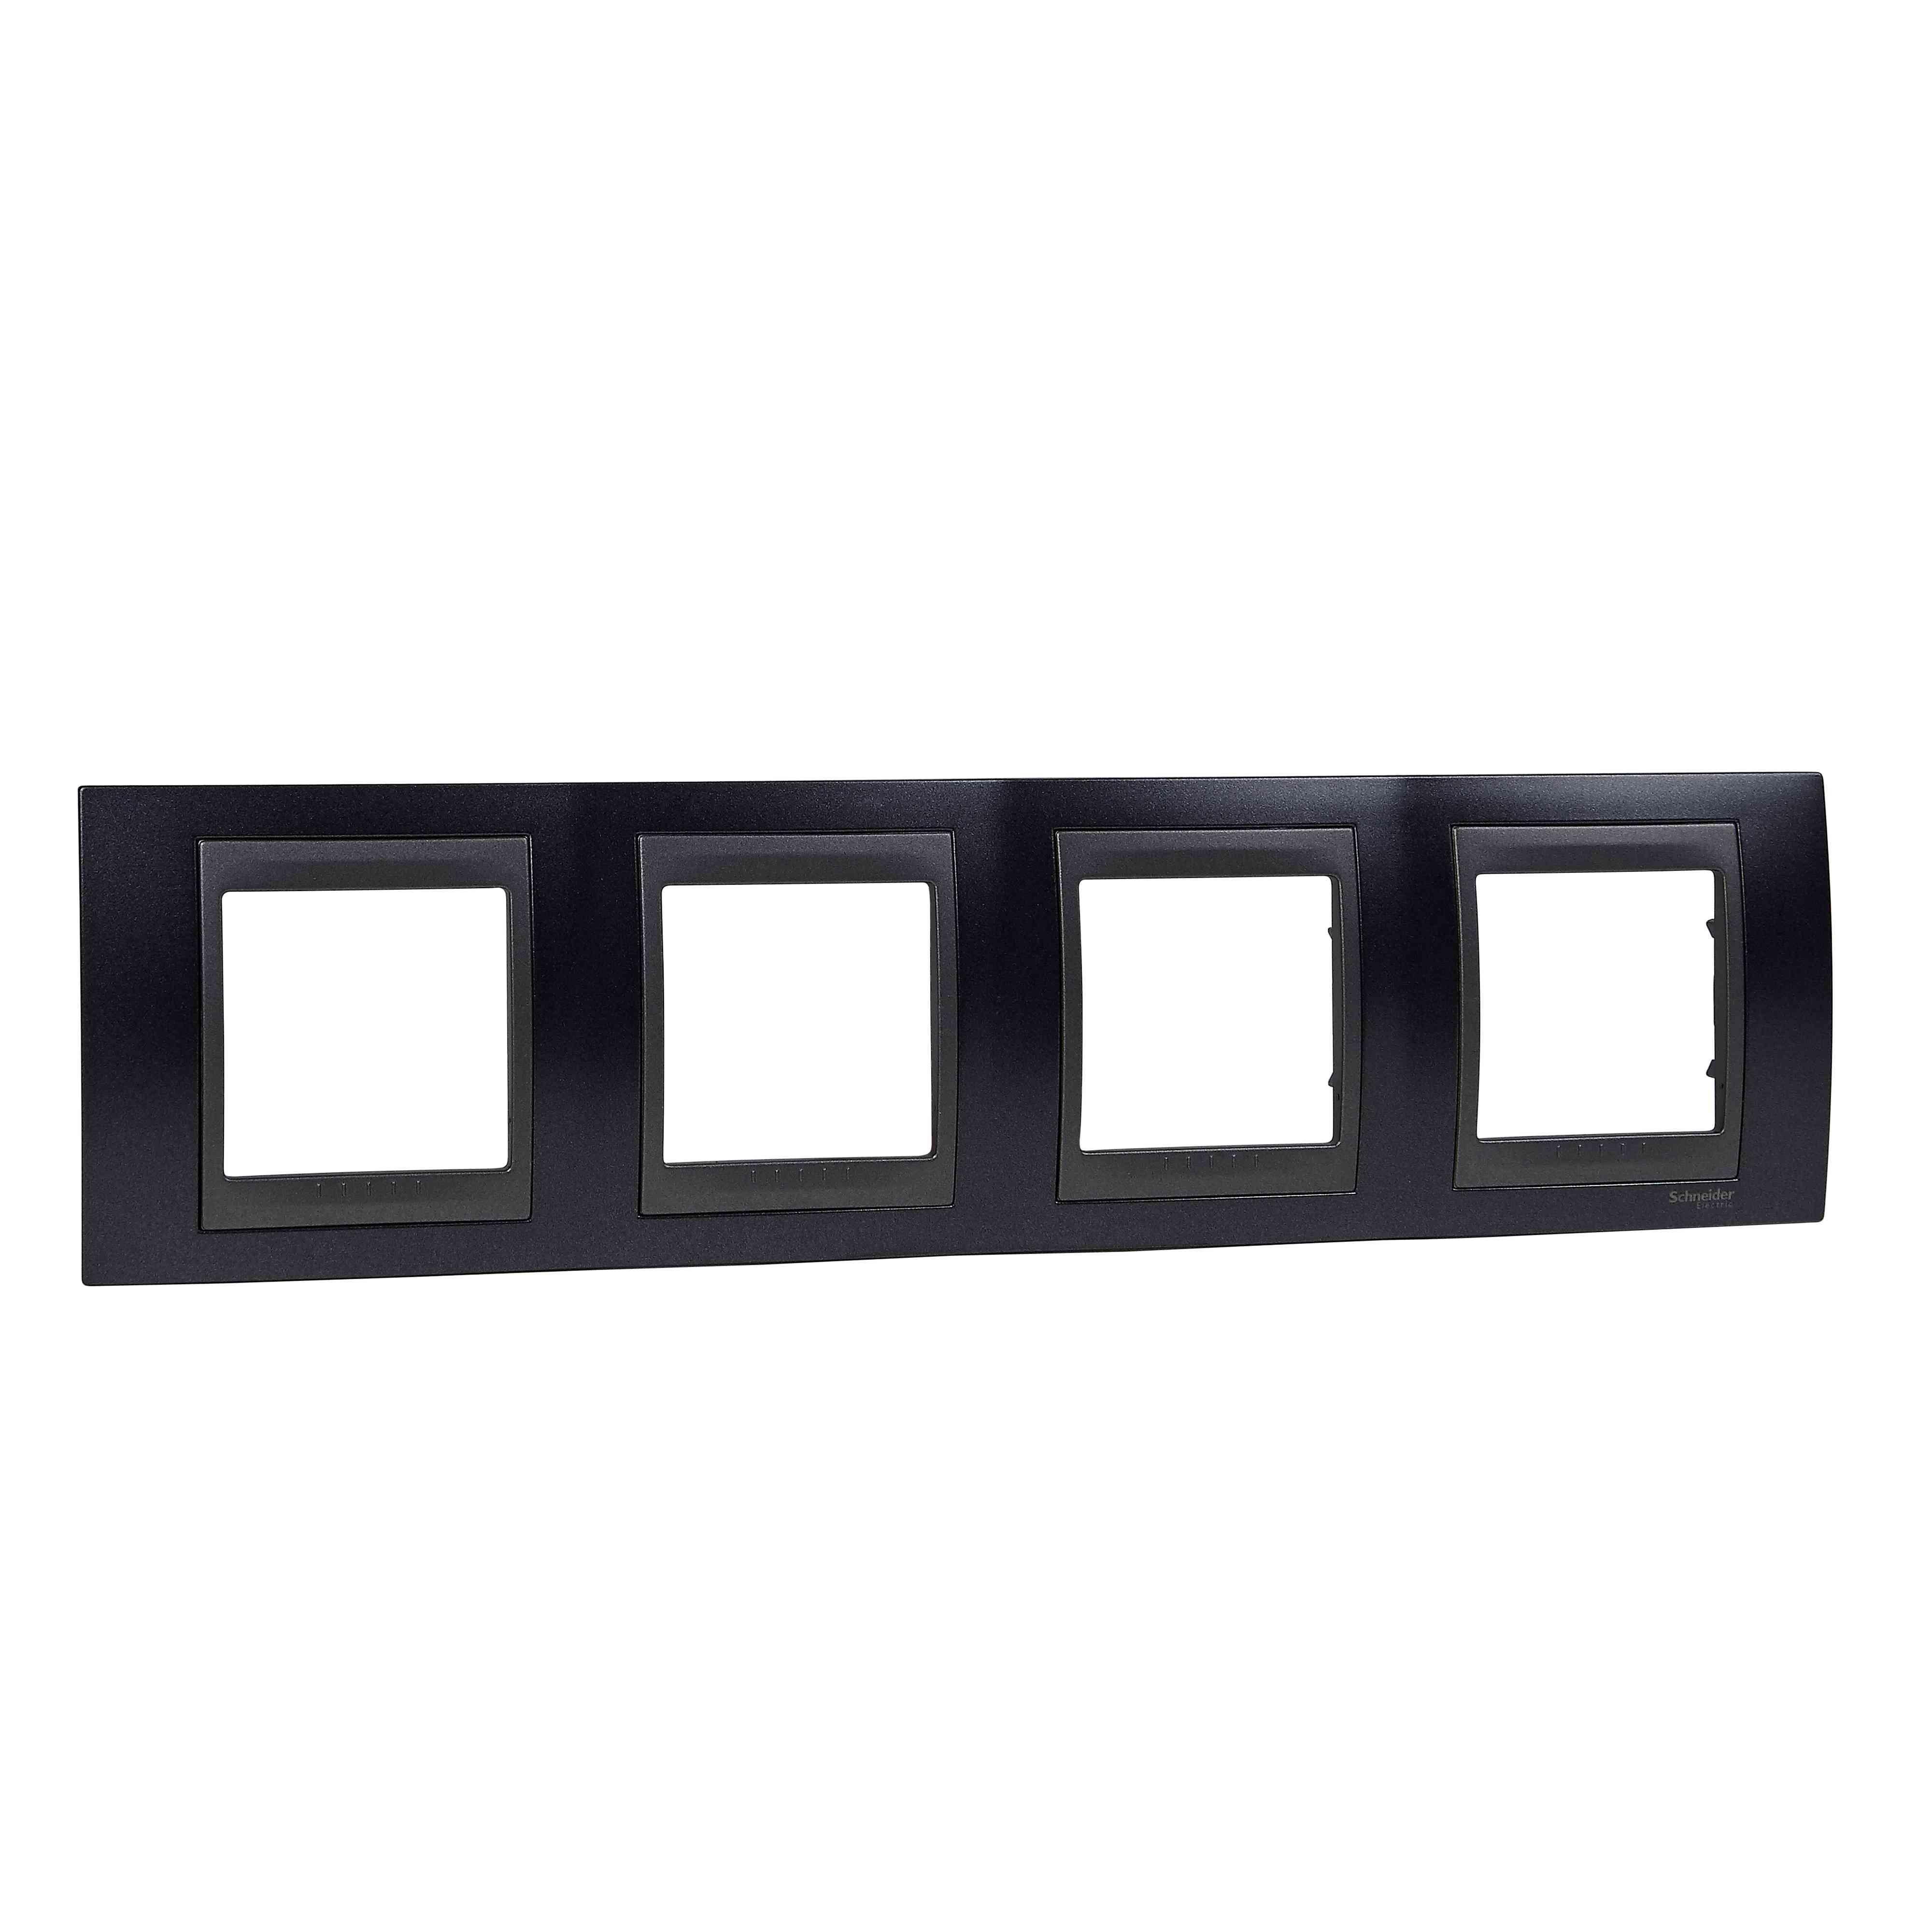 Unica Top - dekorativni okvir - 4 odprtine, H71 - kovinsko siv/b. grafita